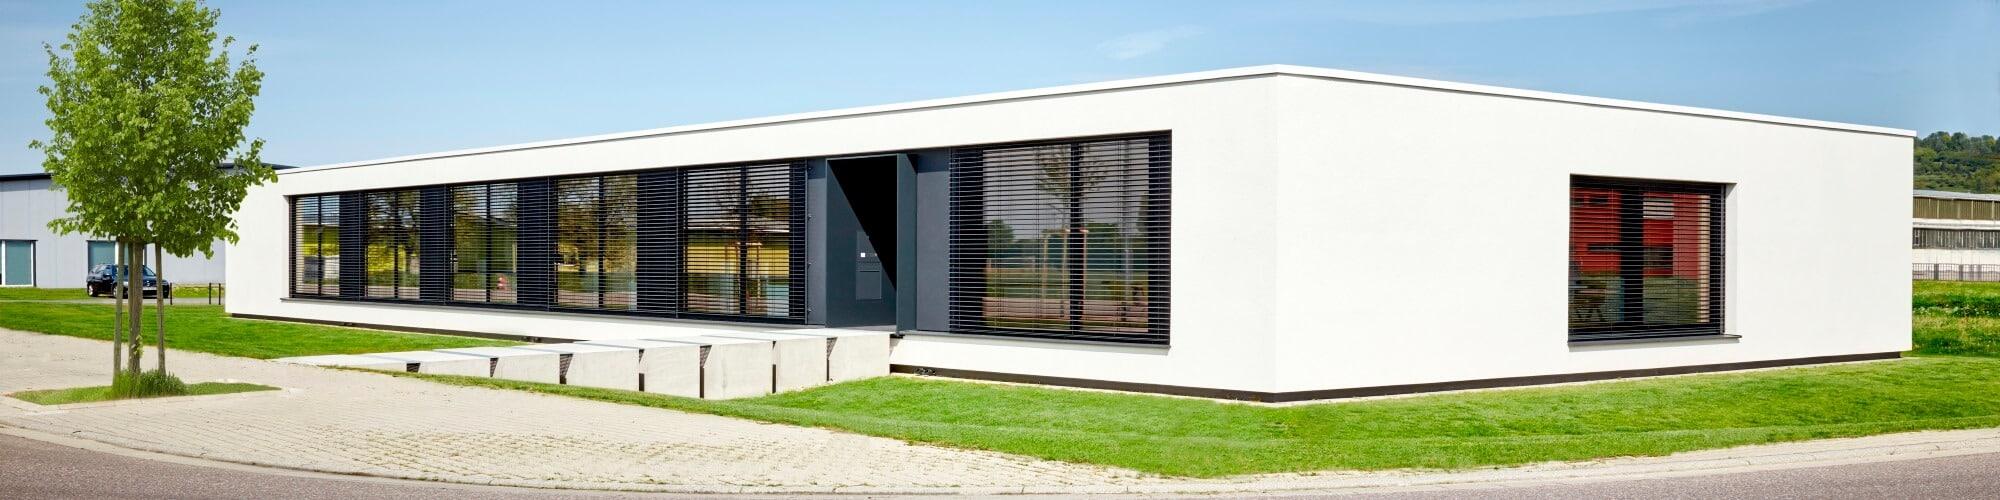 Plusenergie-Büro